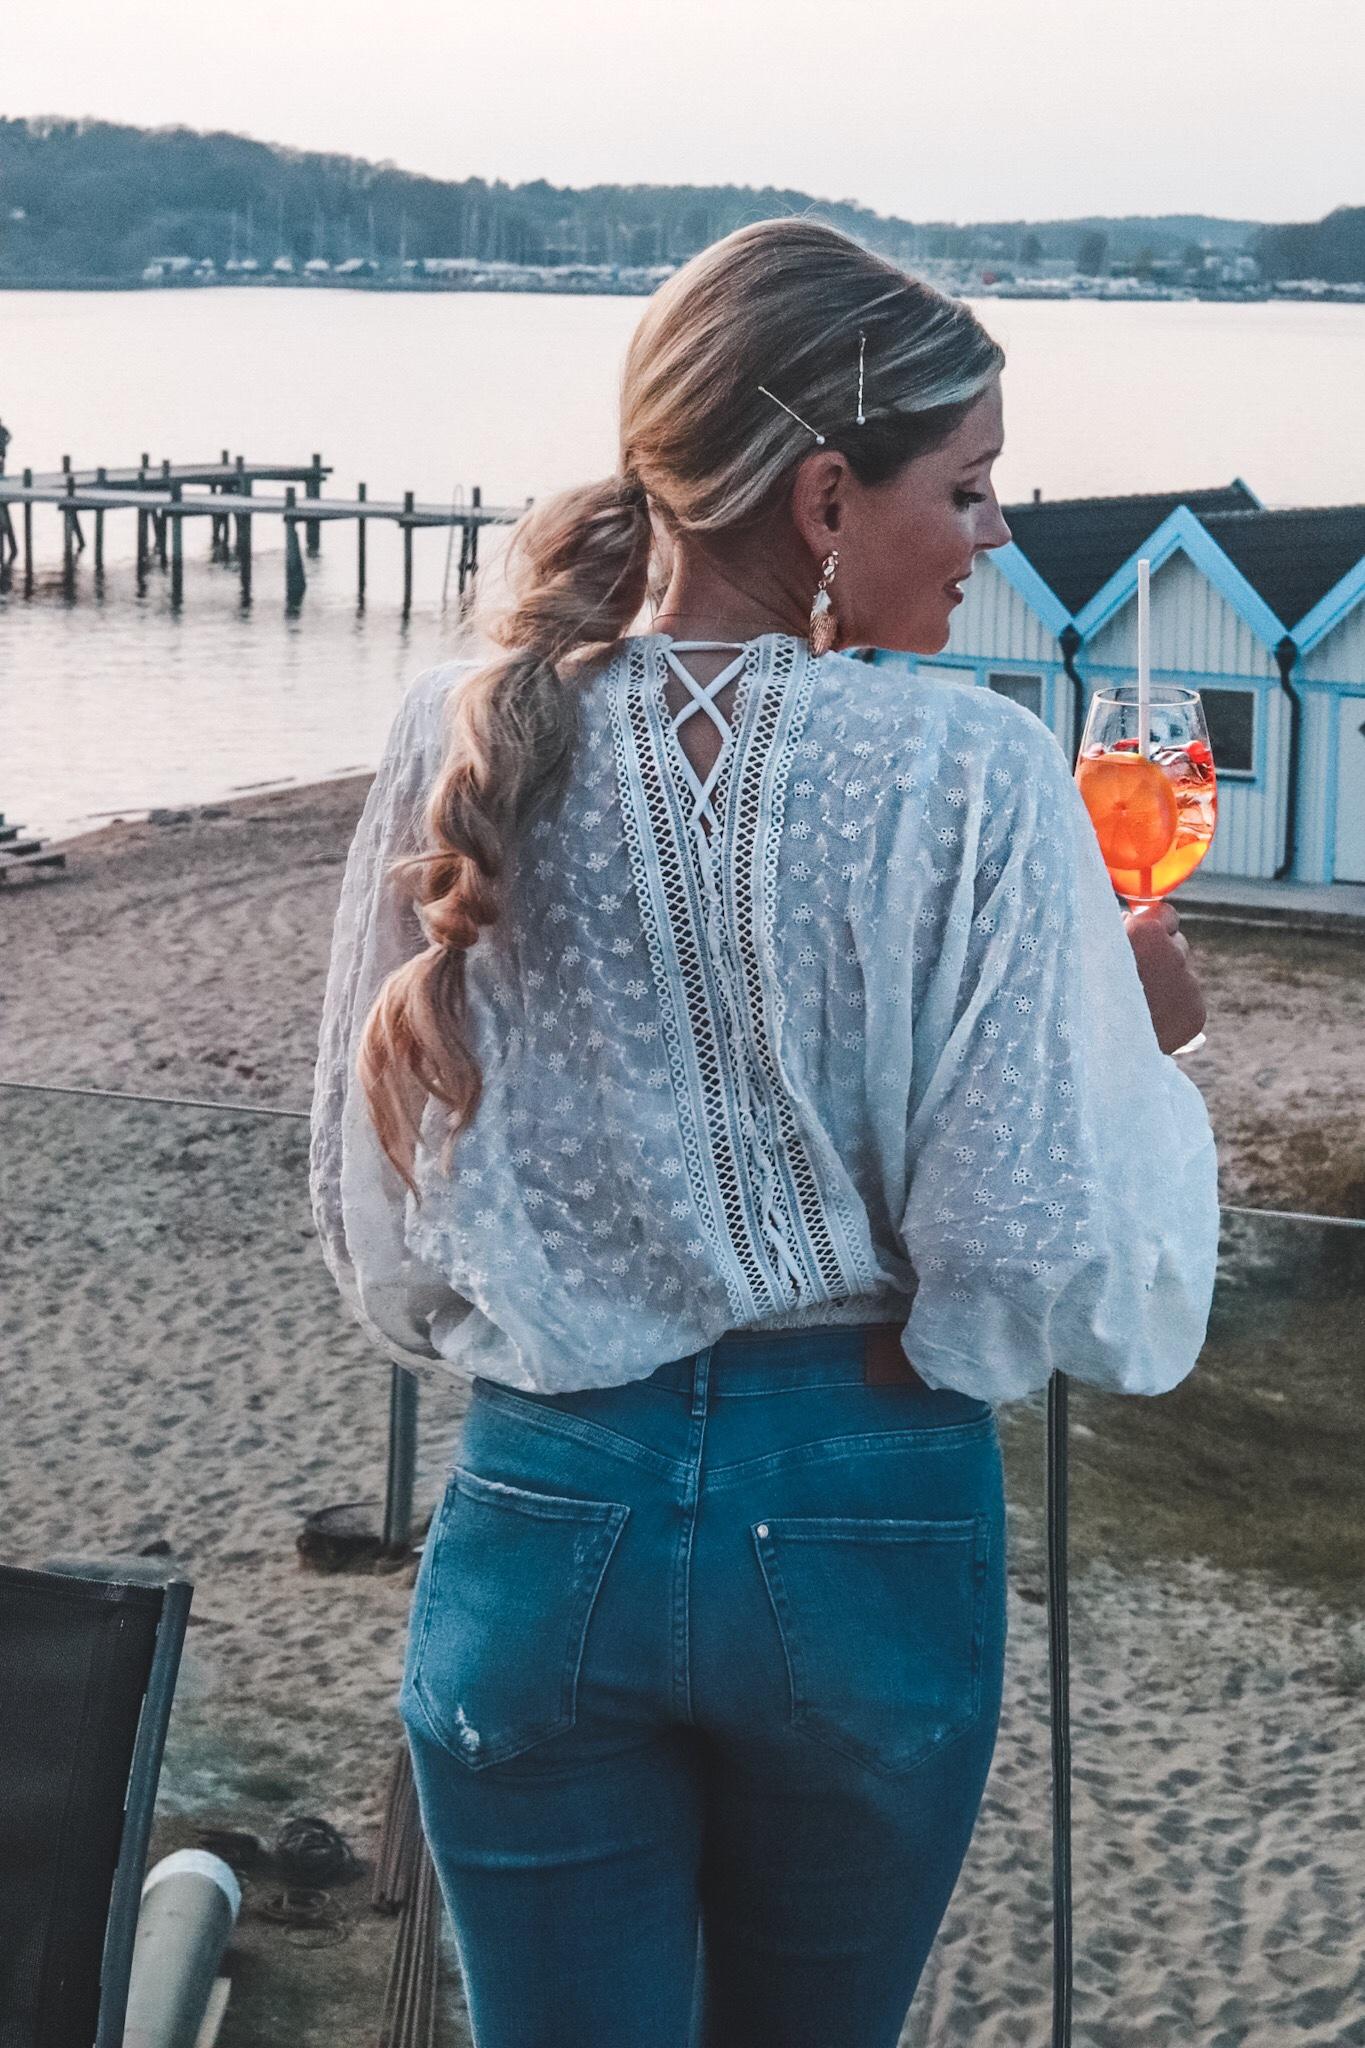 nakd.com blus vit spets brodyr lace up perfekta sommarblusen